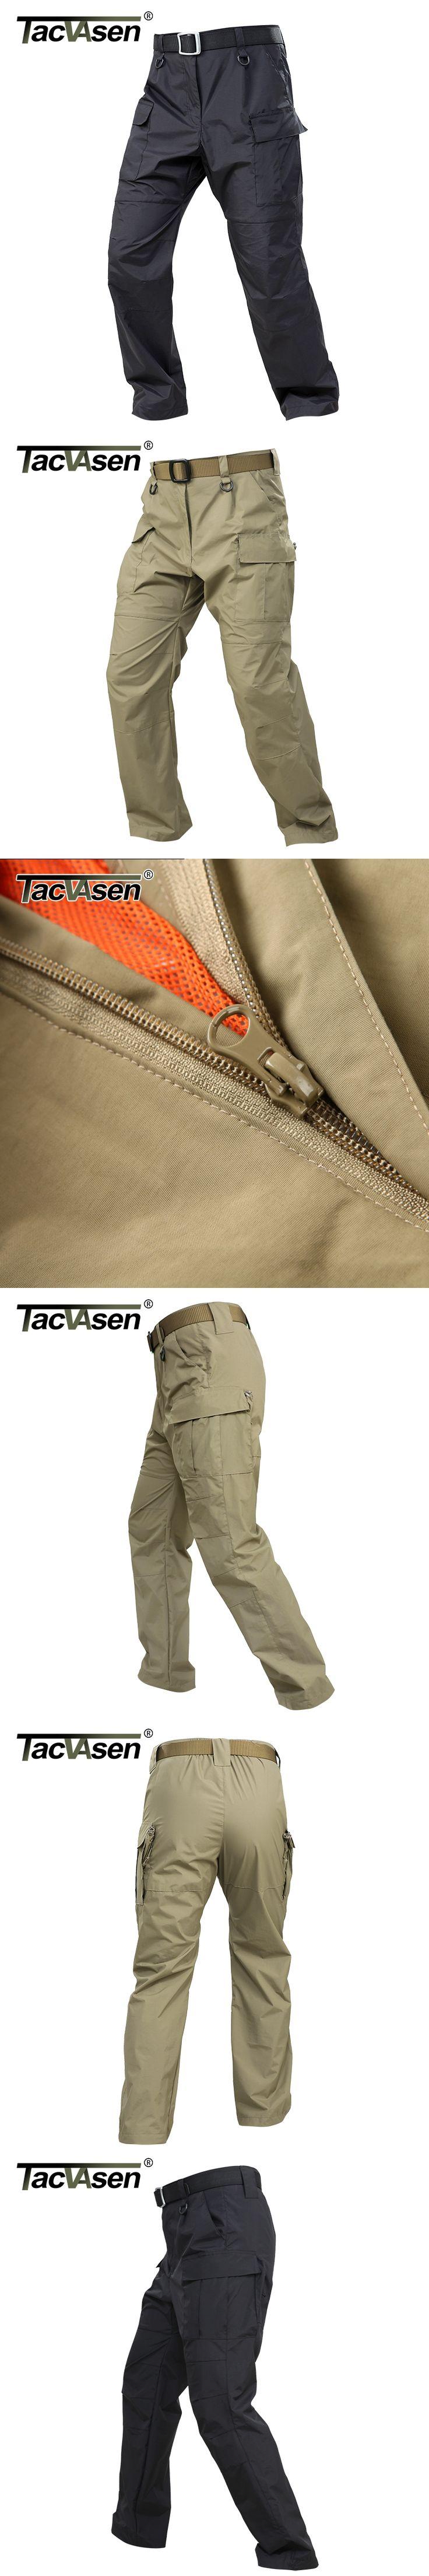 TACVASEN Lightweight Men Pants Military Tactical Pants Men's Waterproof Cargo Pants BDU Combat Trousers For Climb  TD-WJLQ-010